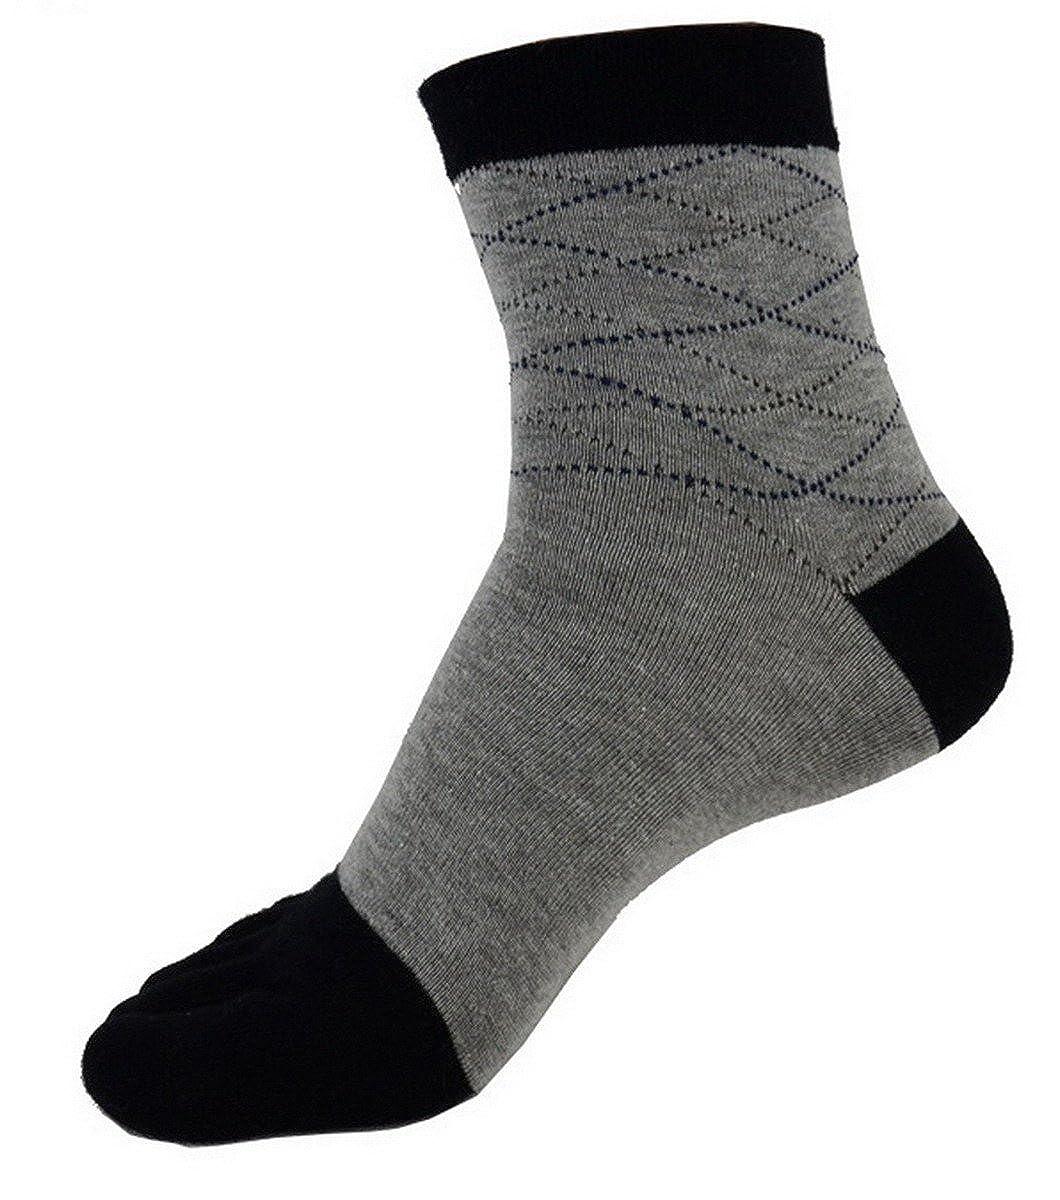 AHATECH Mens Designer Low Cut Cotton Sports Five Finger Toe Daily Socks 6-Pack